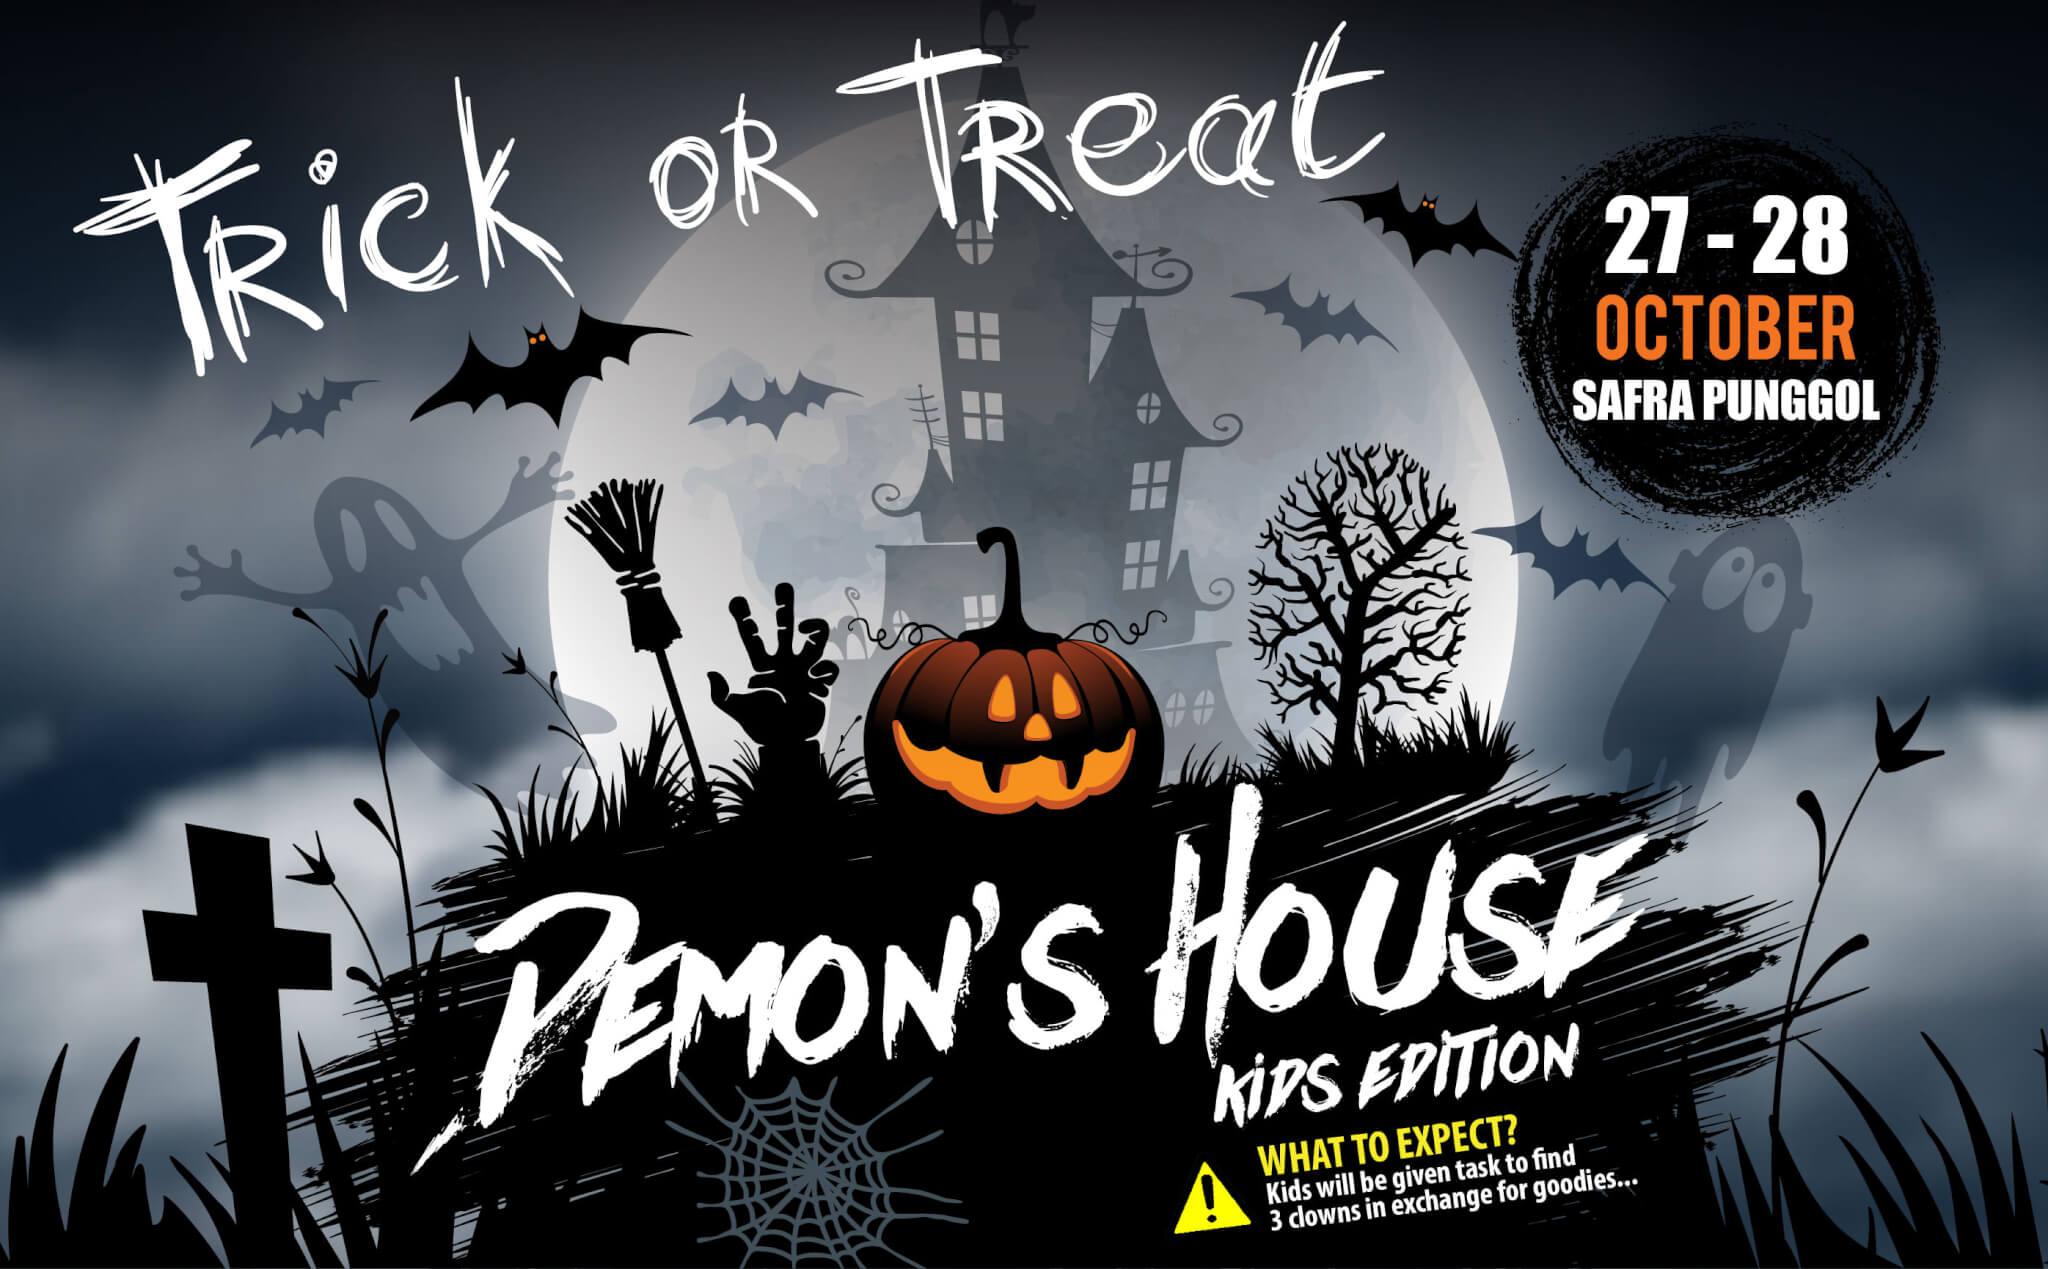 SAFRA Punggol's Demon's House, 27 to 28 Oct 2017